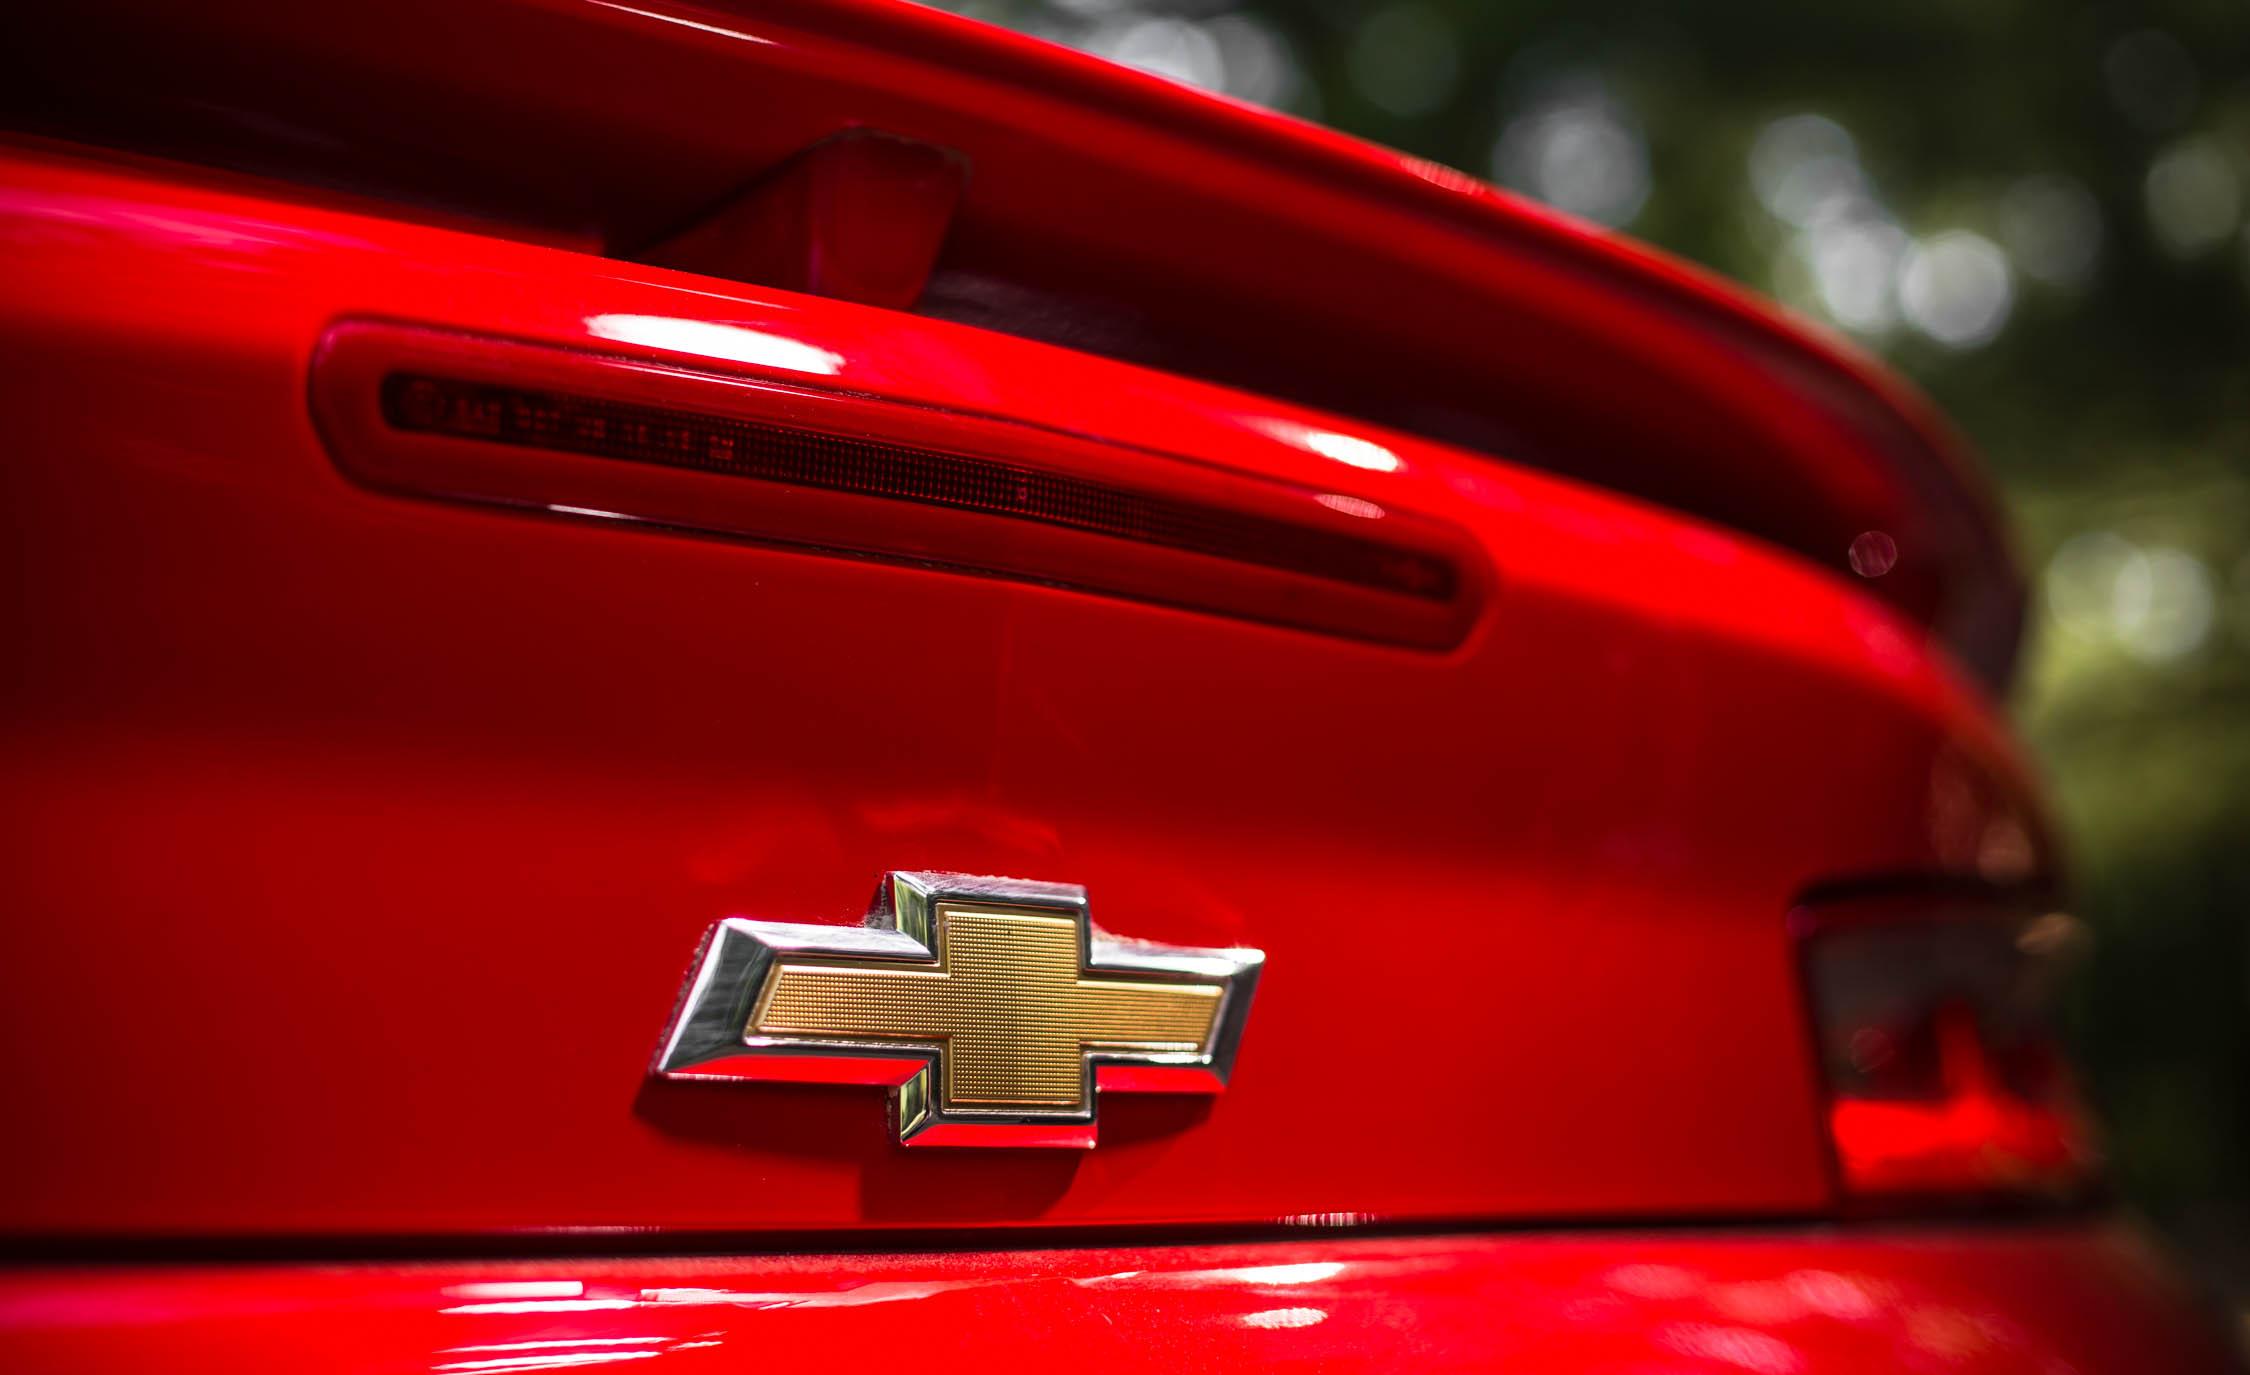 2016 Chevrolet Camaro SS Exterior Rear Badge